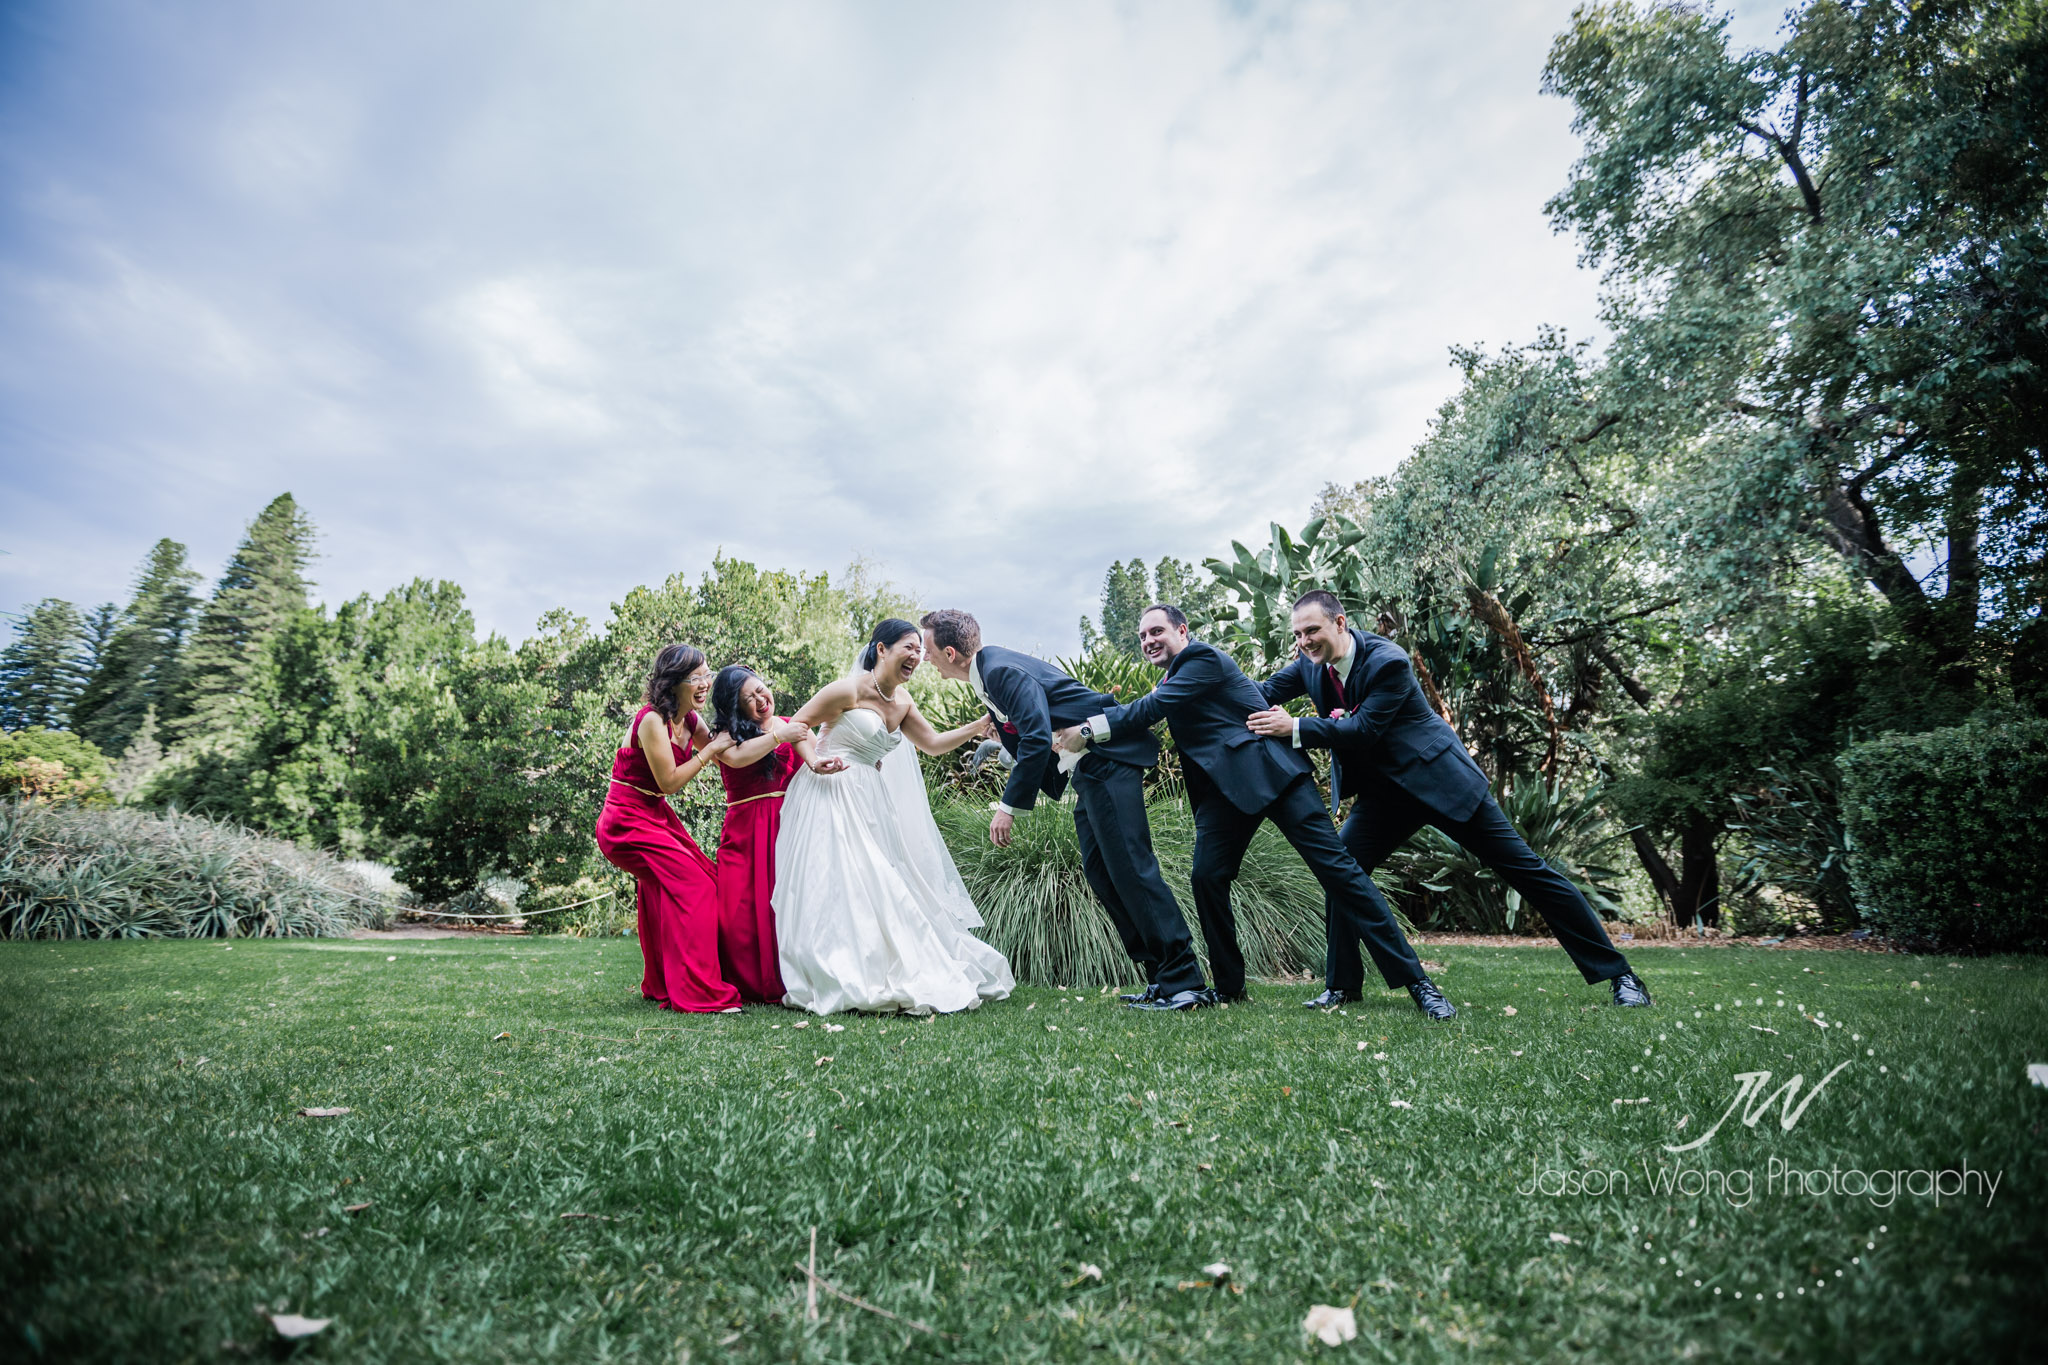 bridal-party-tug-a-wall.jpg